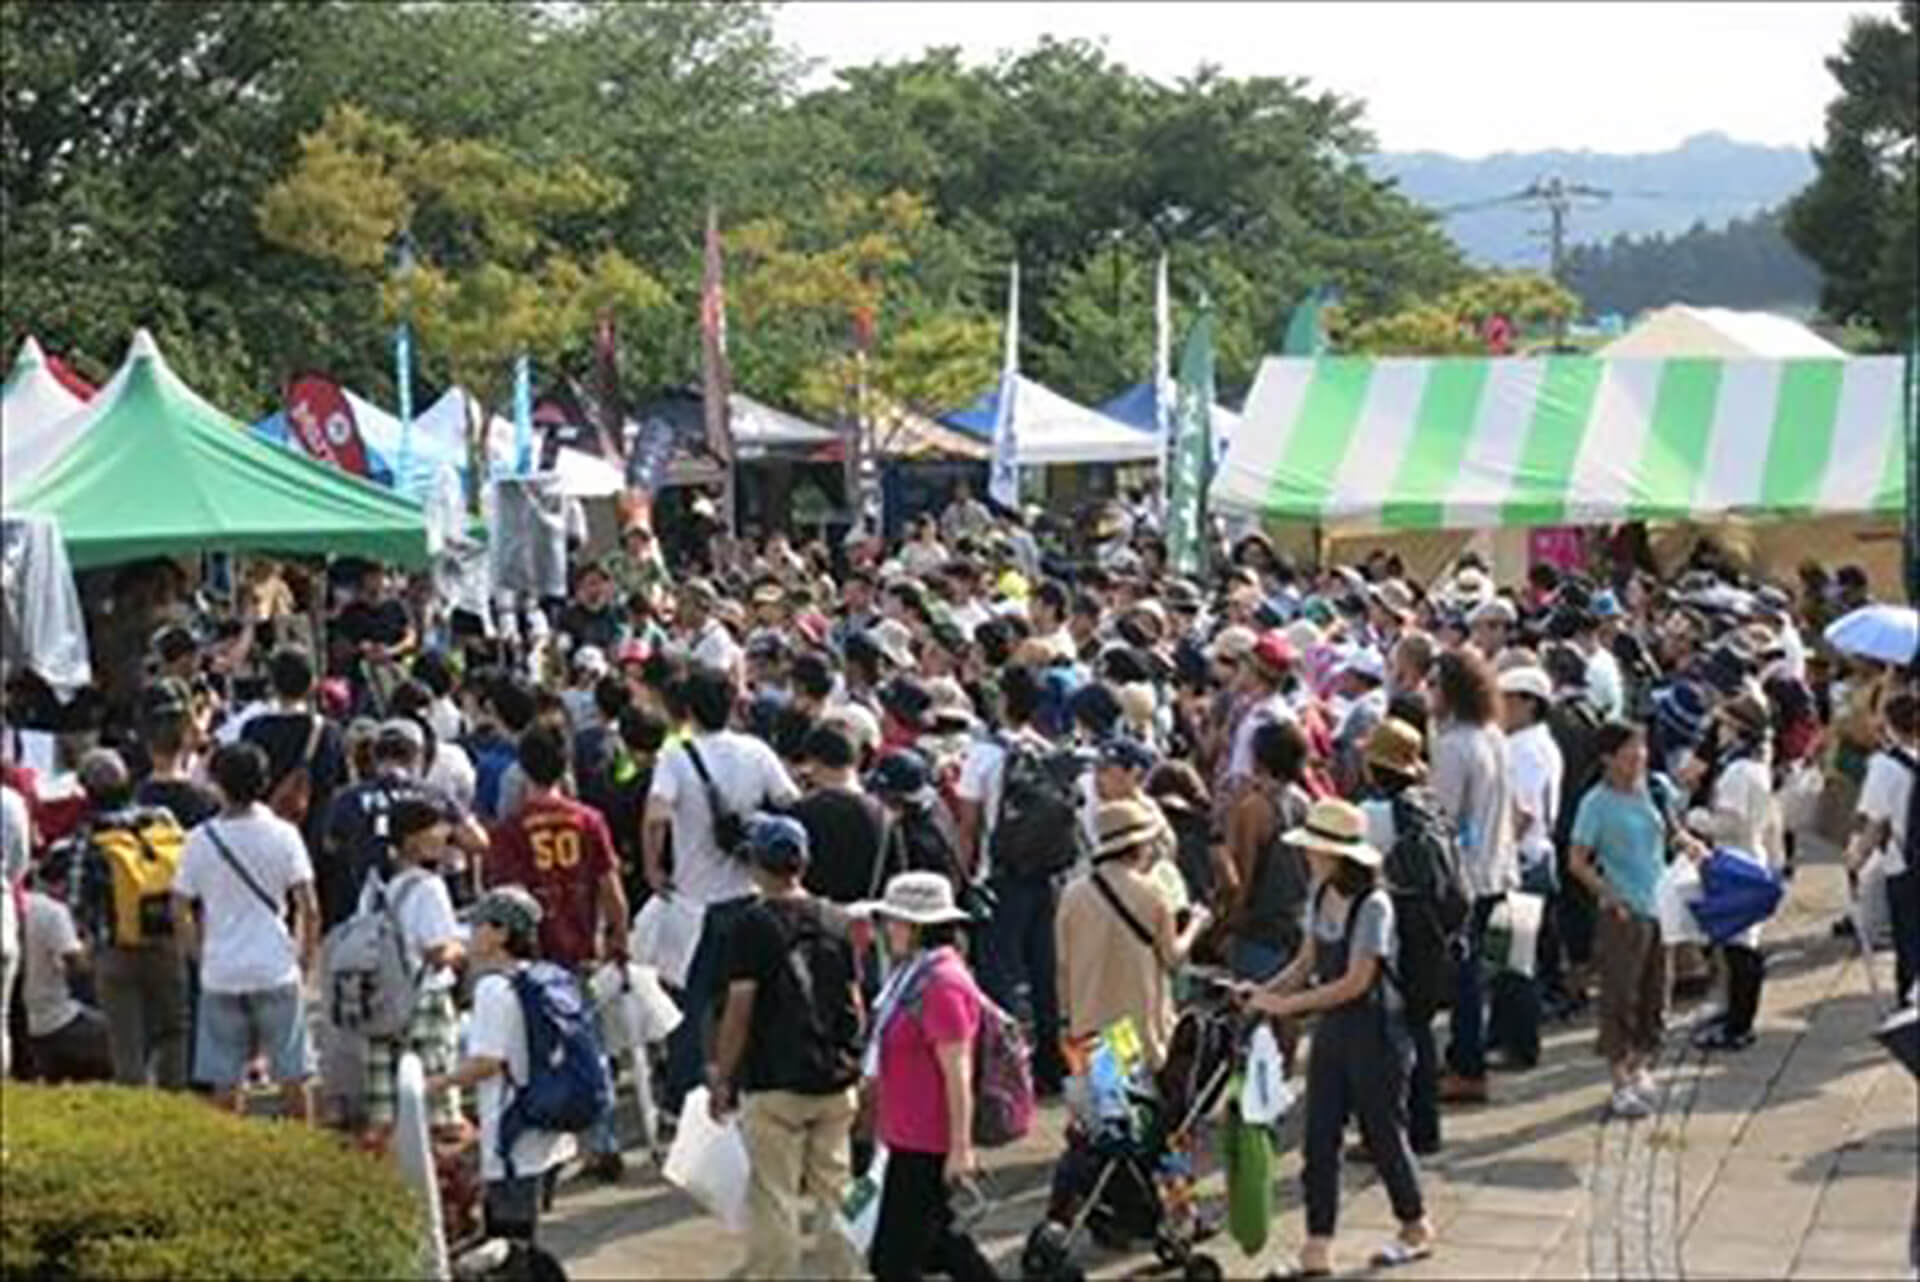 TANZAWA山モリ!フェス2019の前回のイベント風景